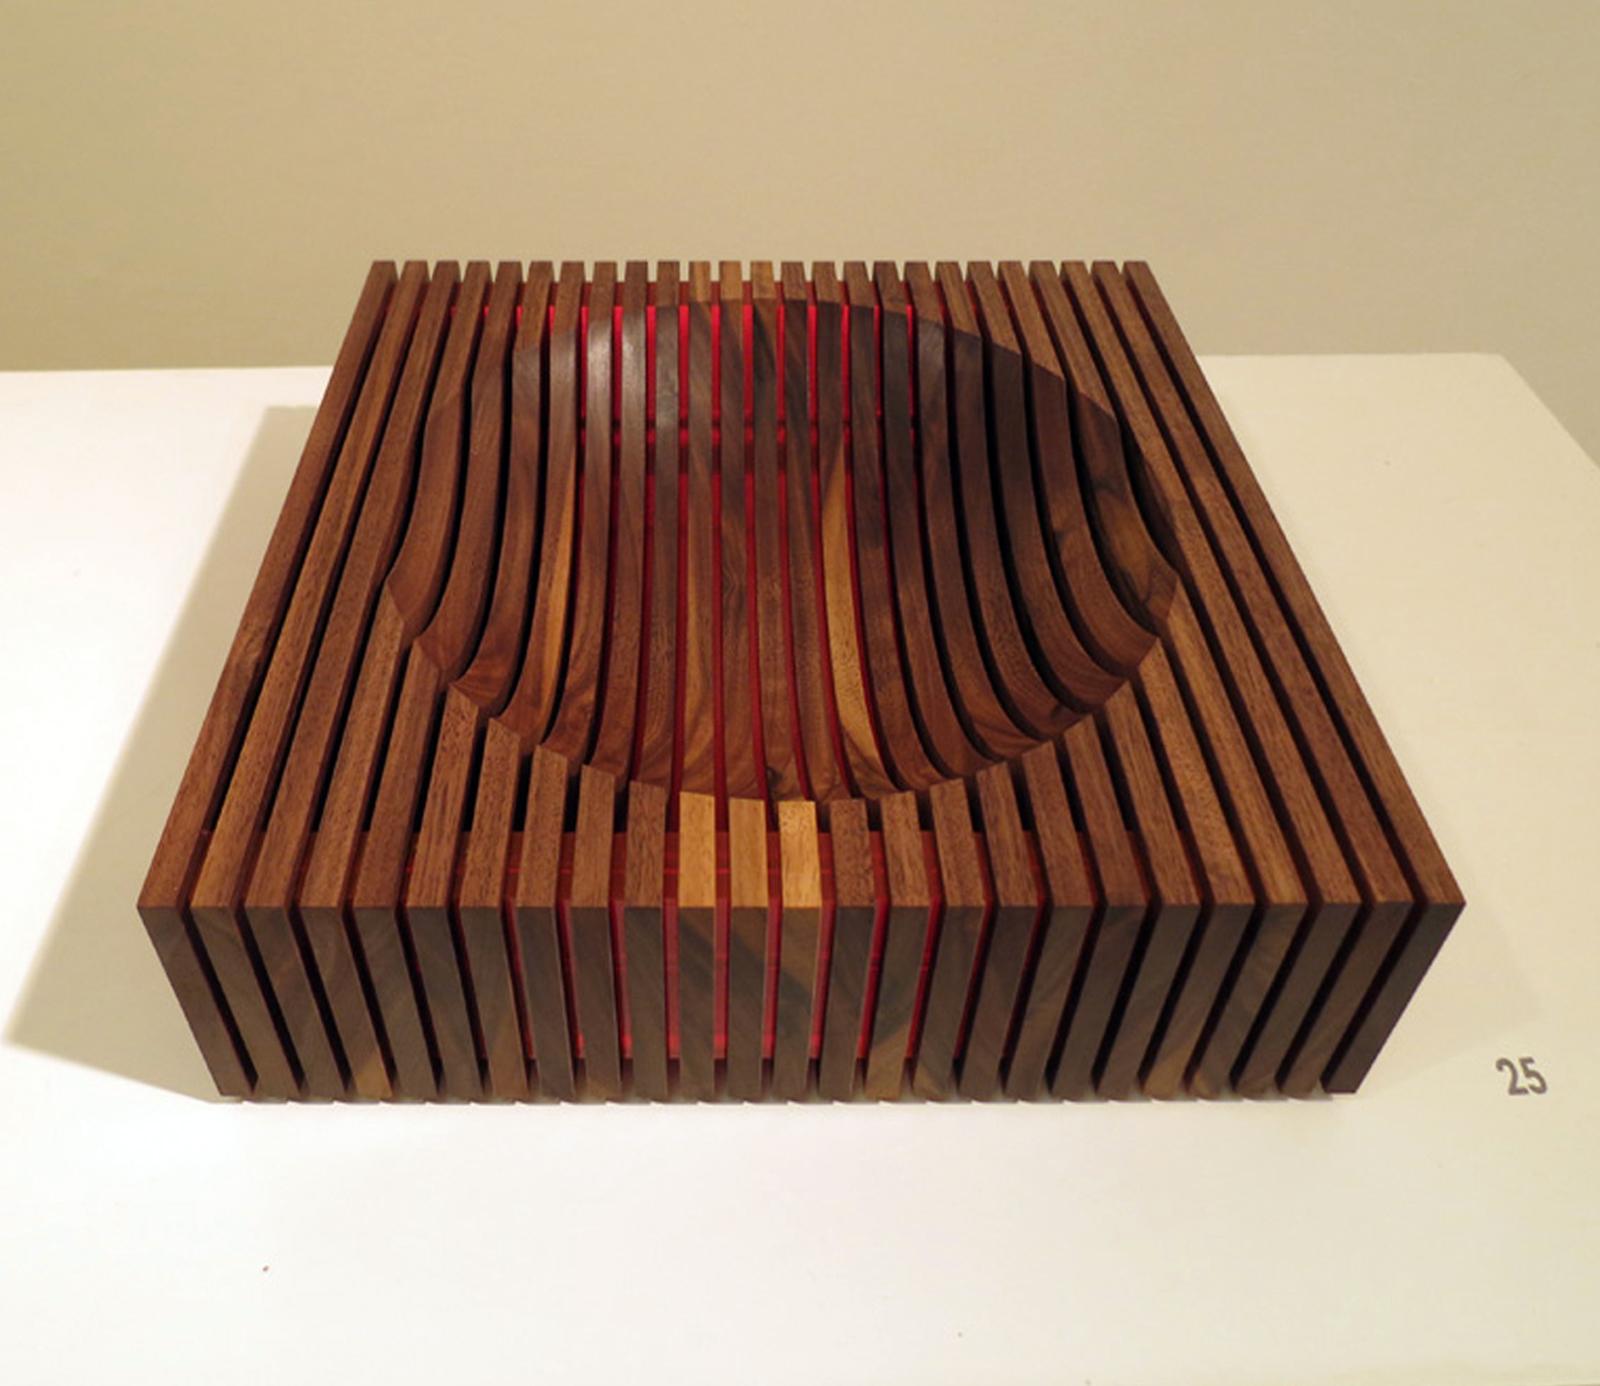 25. Hemisphere III , Brendan Jurich, American Black Walnut, acrylic, aluminium, titanium, $790